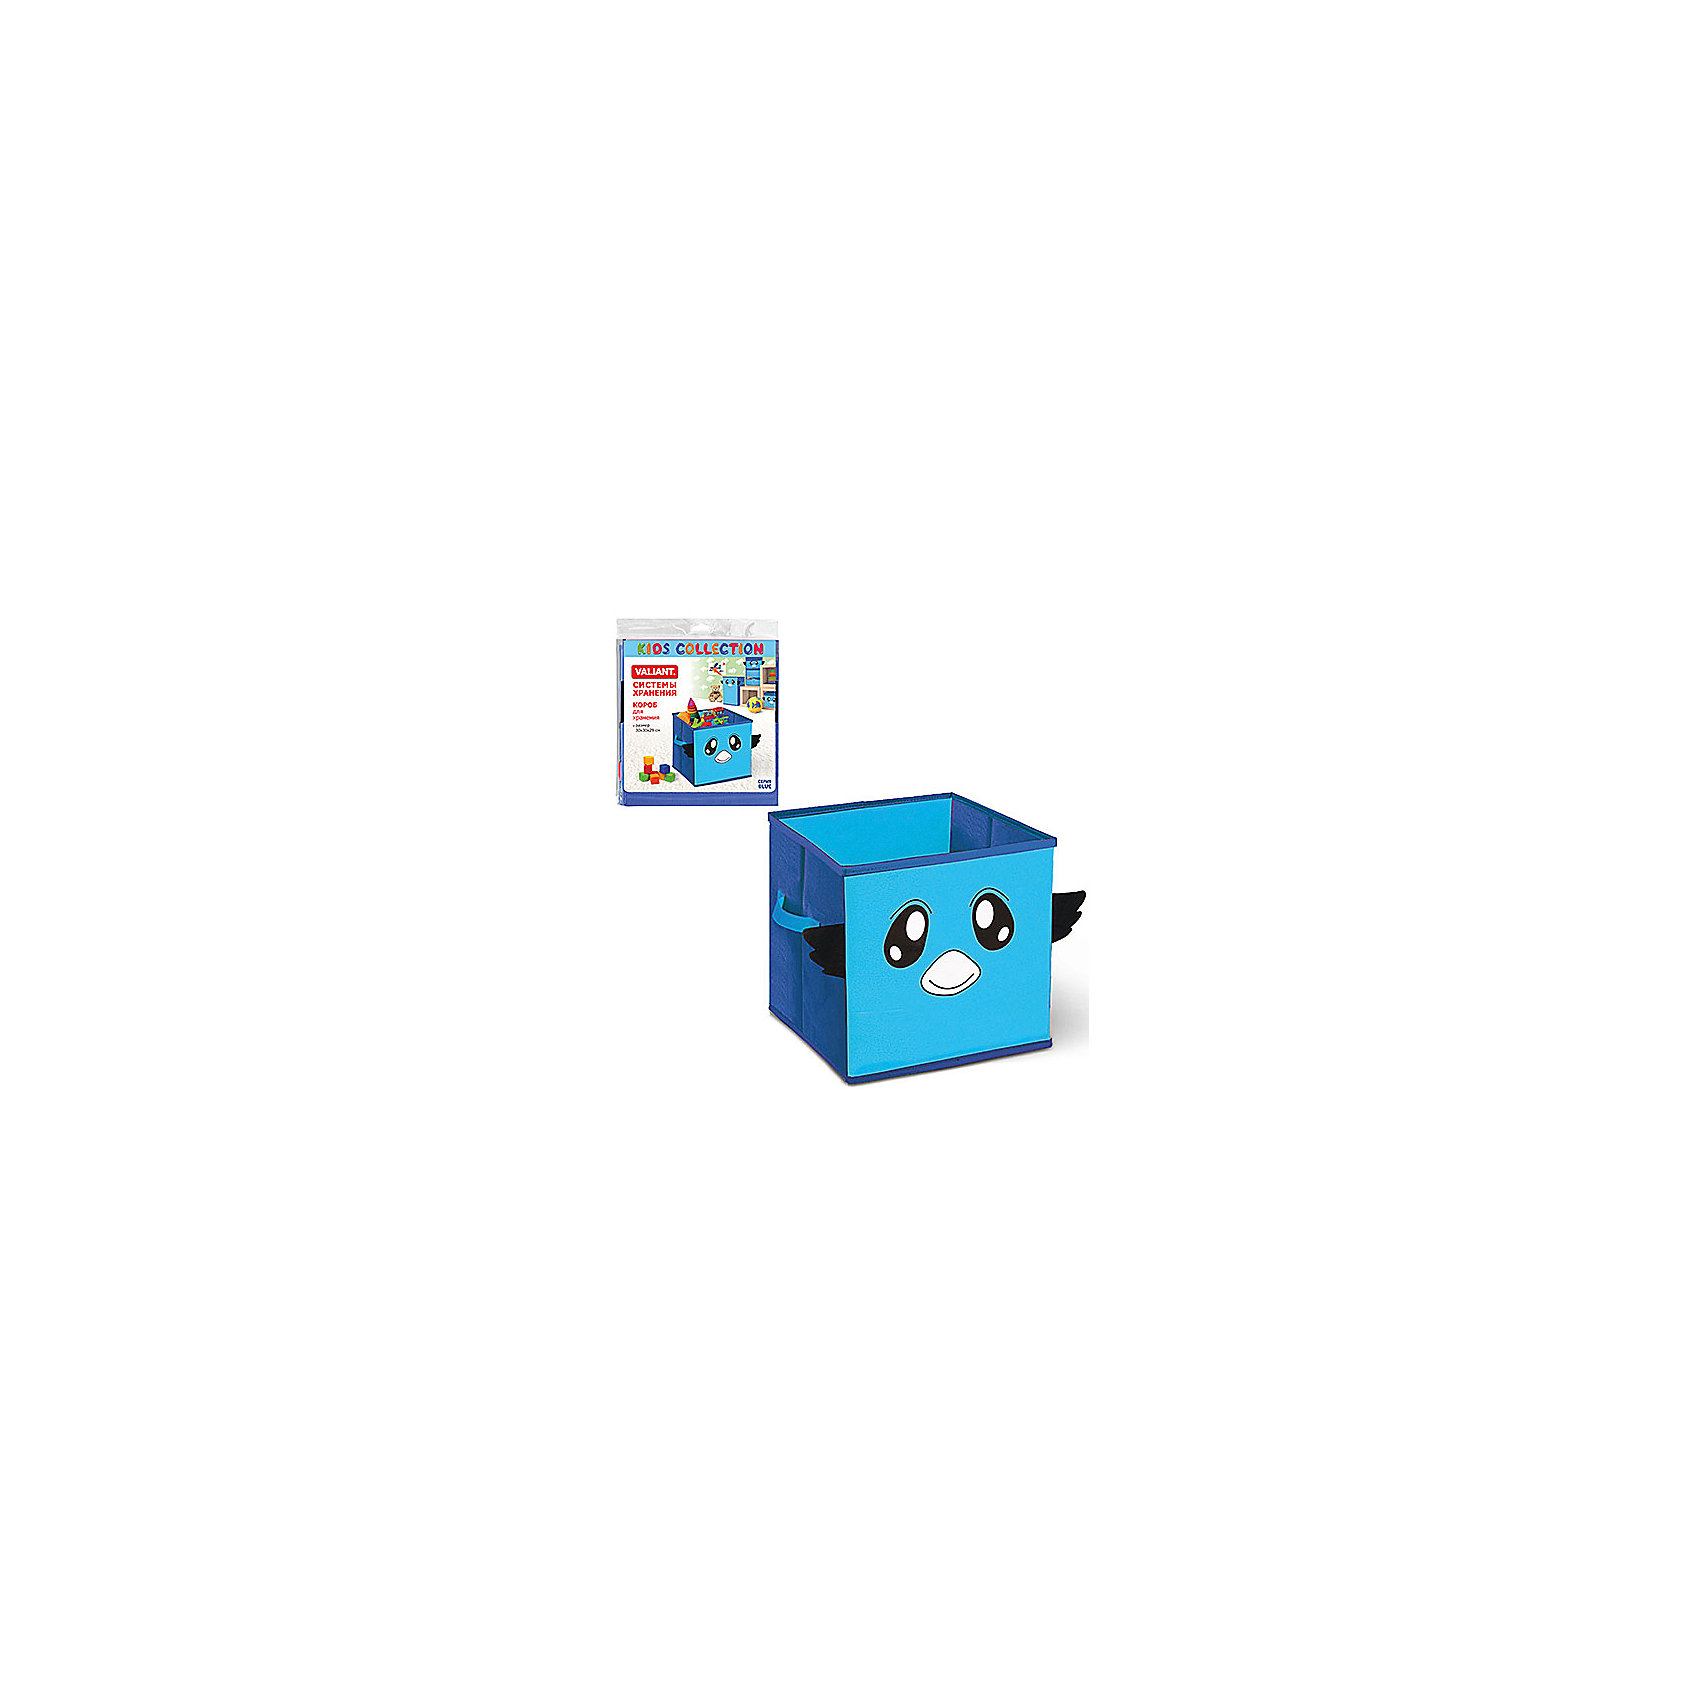 VALIANT Голубой короб для хранения 30*30*29 см